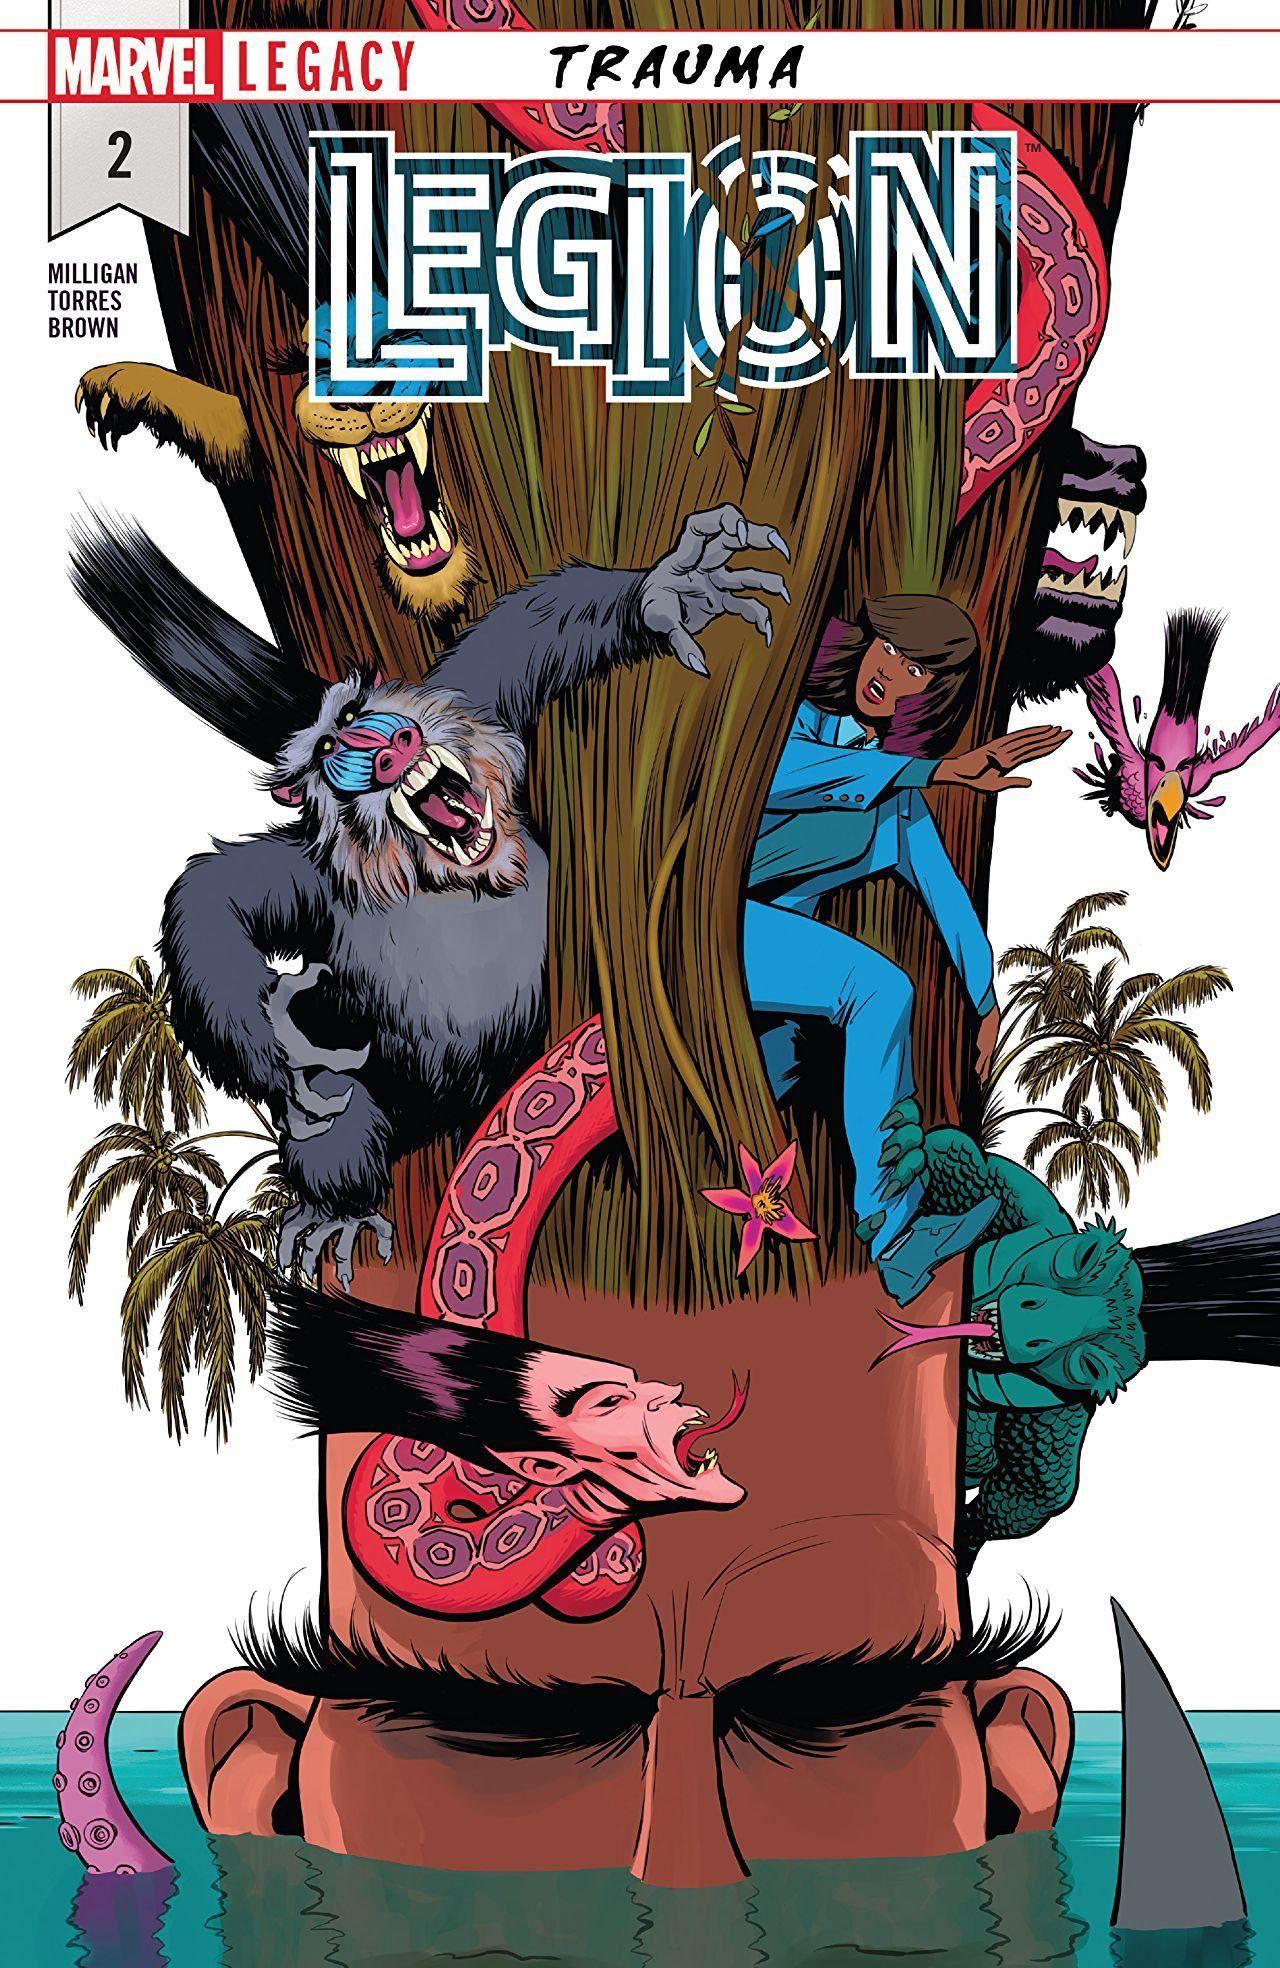 Legion 2018 2 Of 5 Comics By Comixology Marvel Legion Legion Legion 2